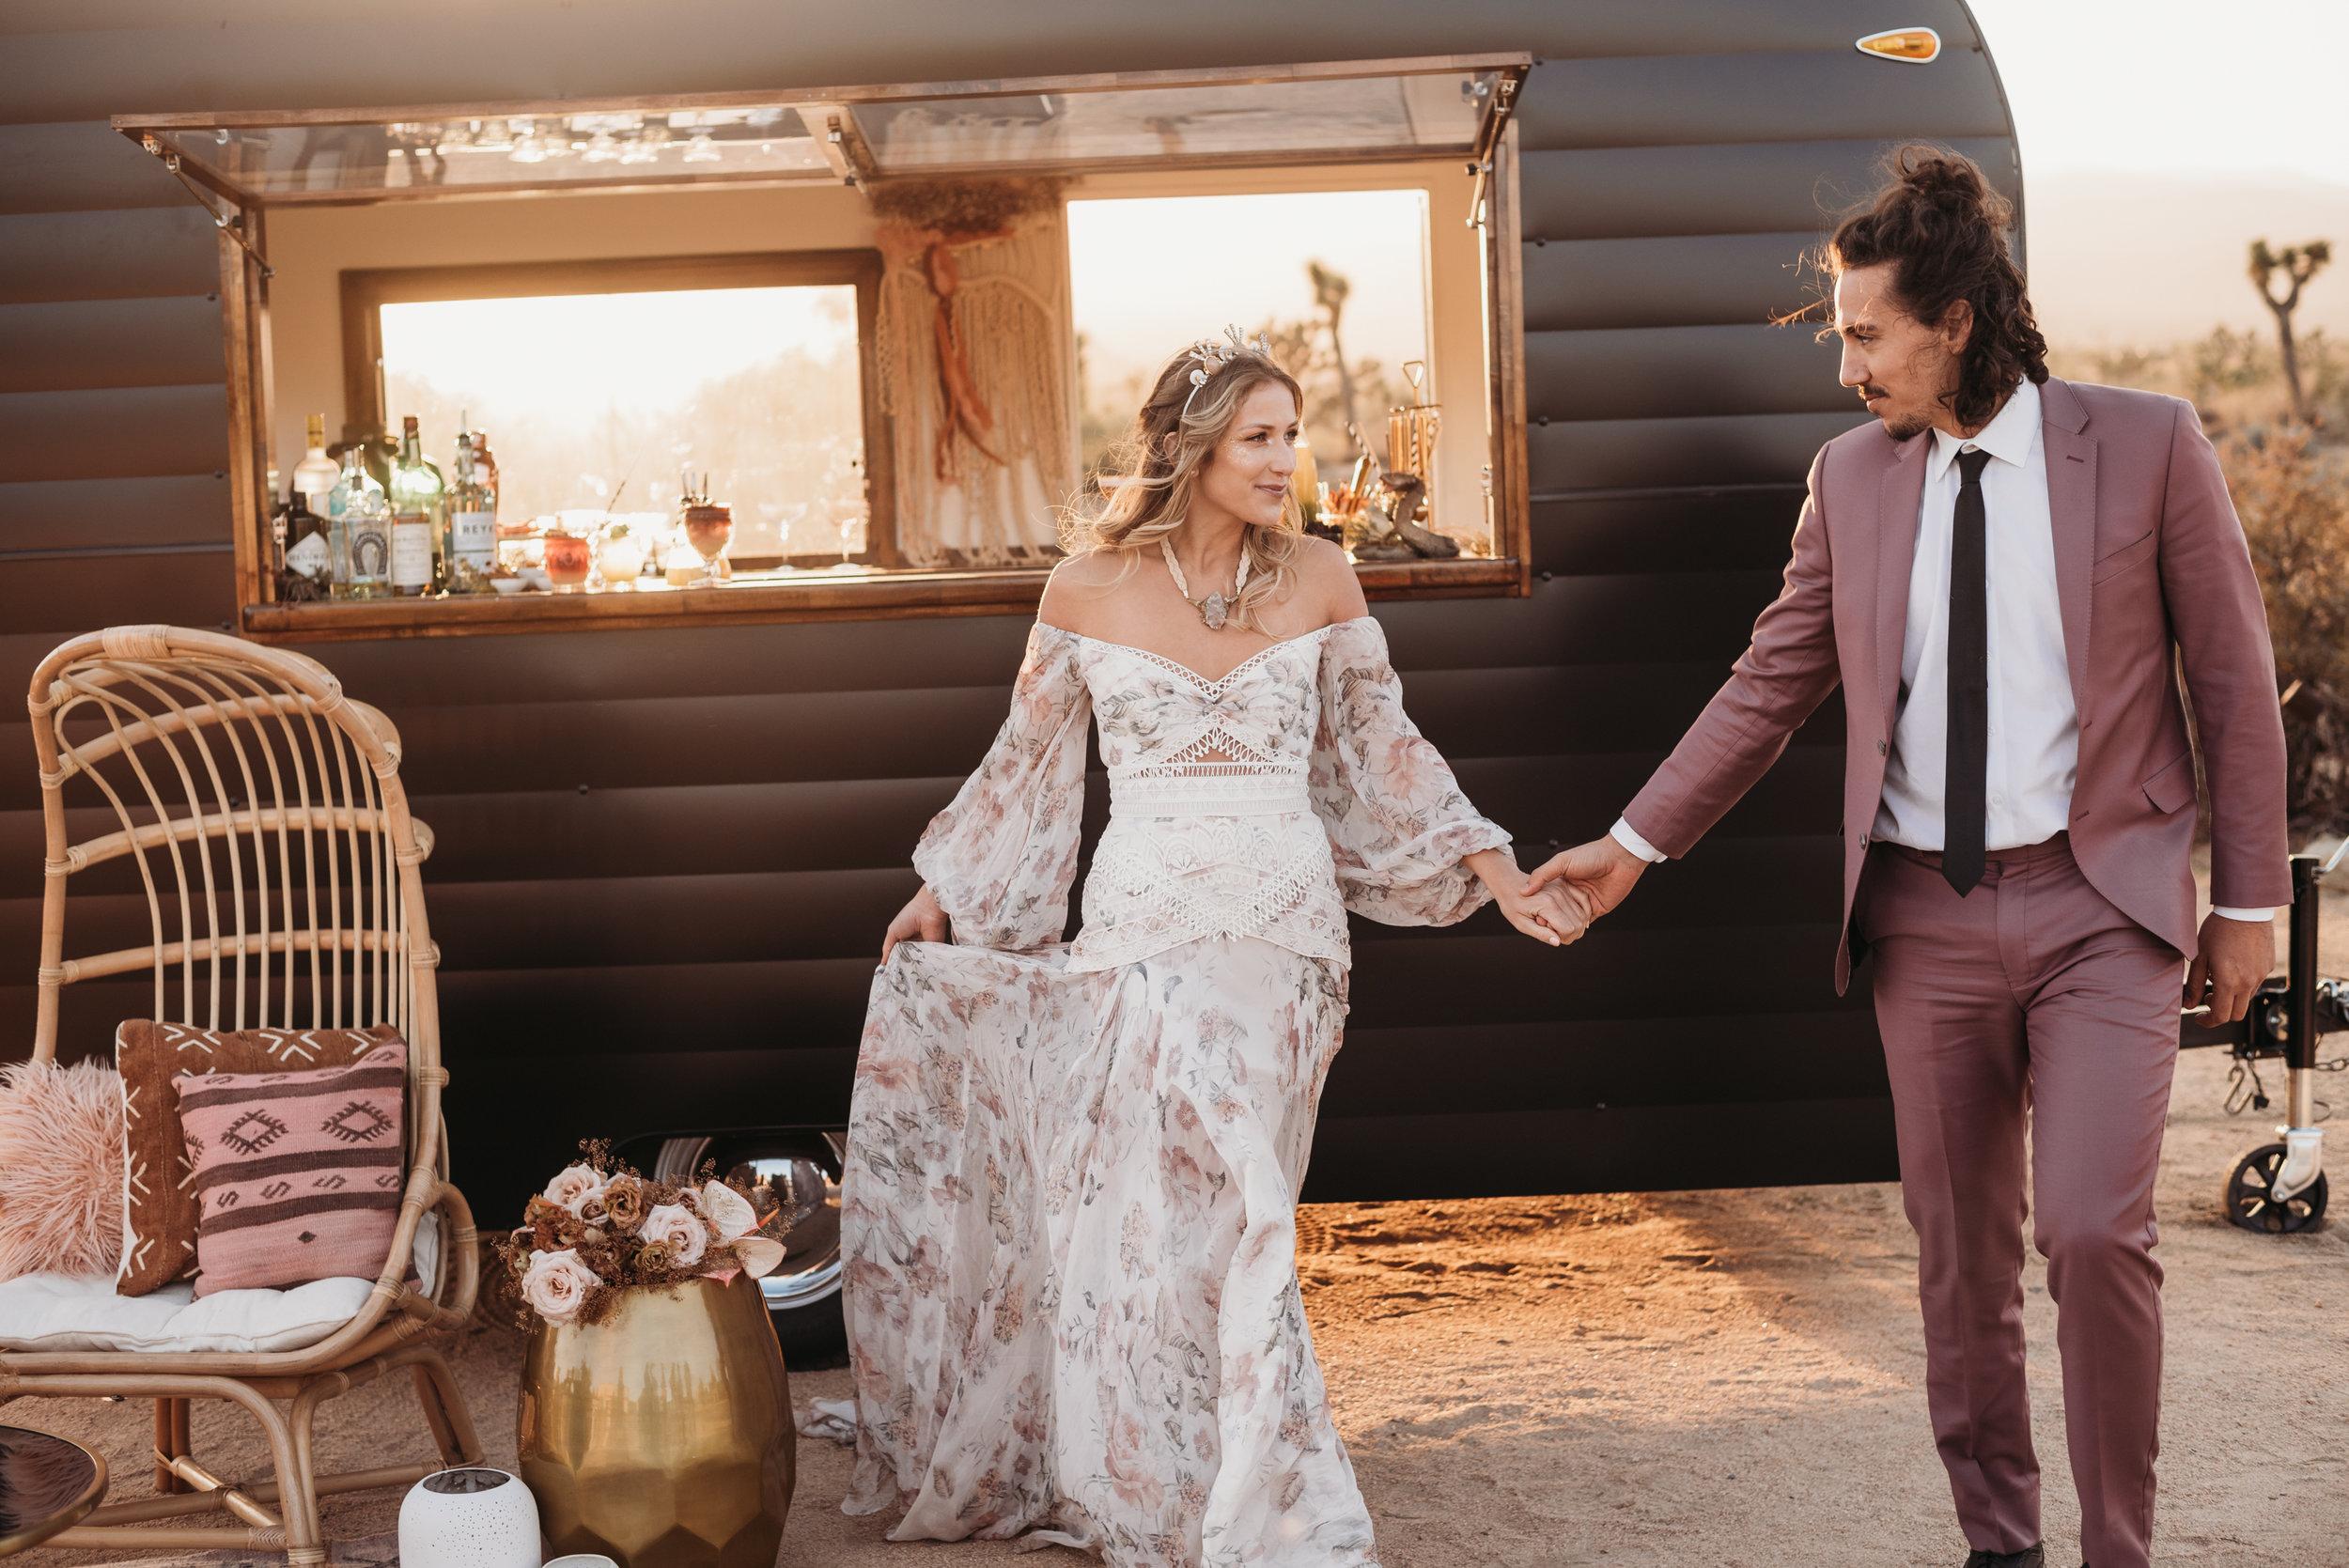 FortSt.John_photographer_TyraEPhotography_Wedding_Couple_Family_Photograhy_DawsonCreek_Elopement_Bride_Boduoir_Portraits-8383.jpg